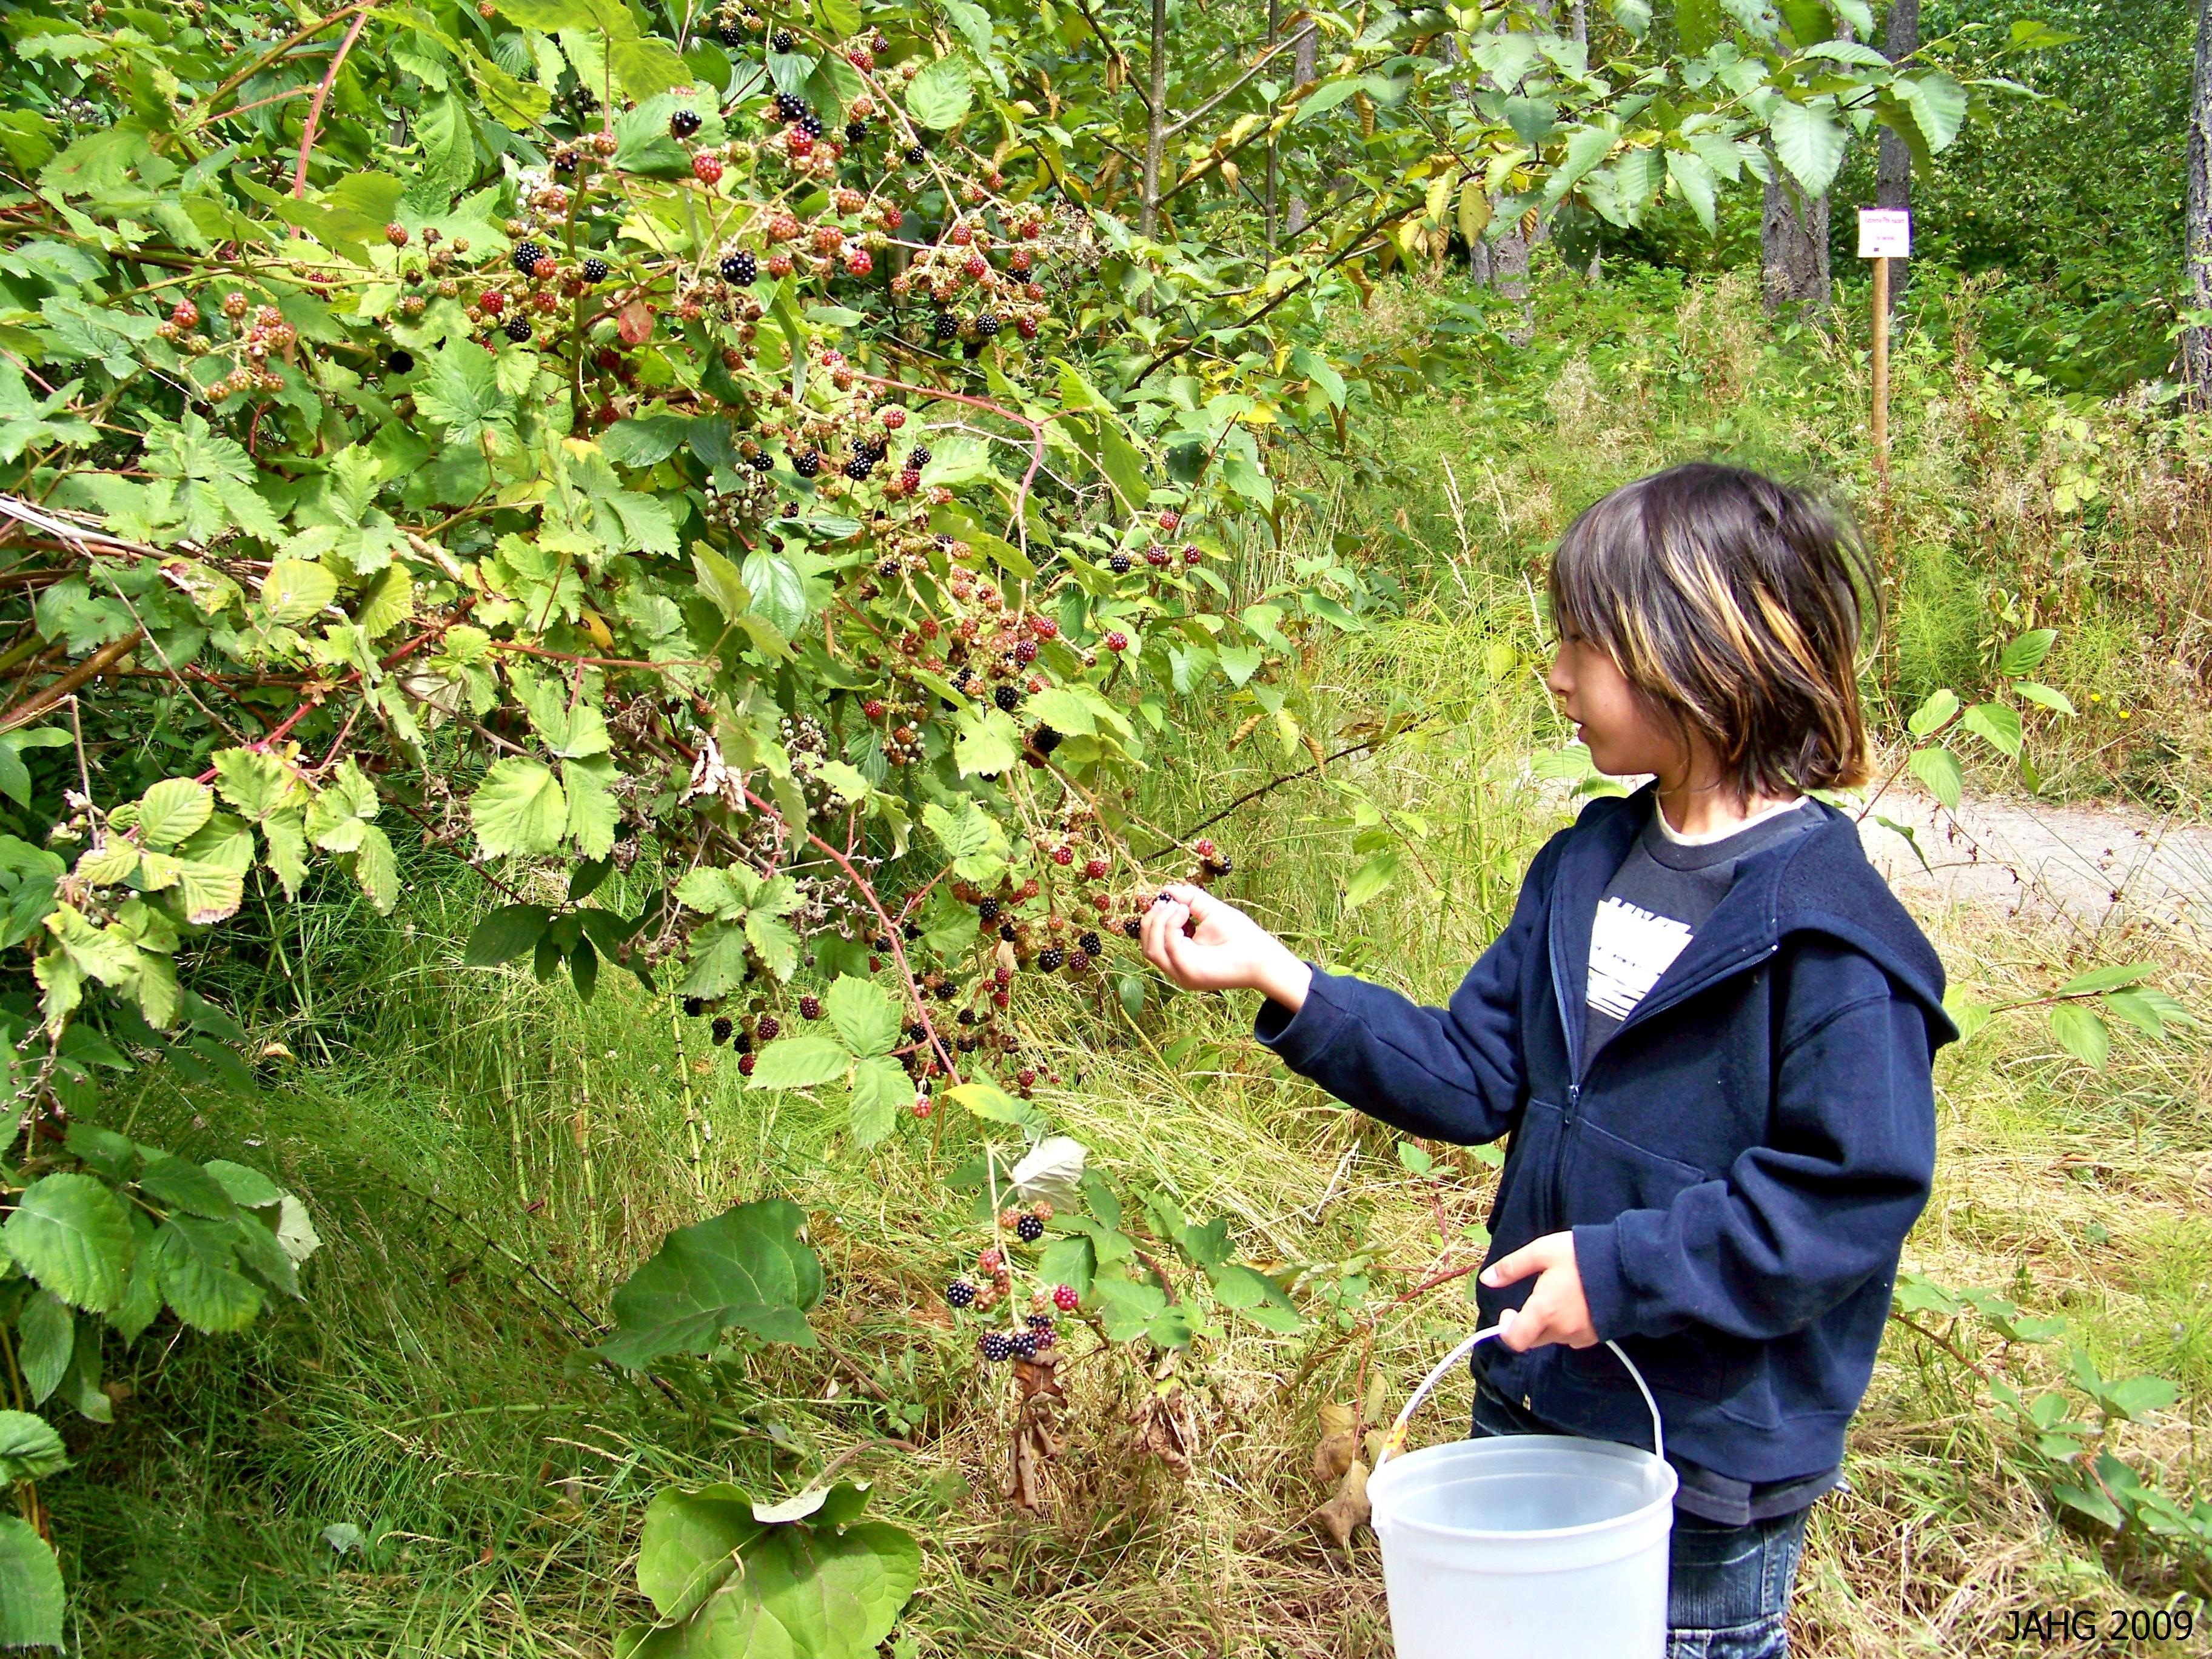 My nephew Owen picking Armenian Blackberries.